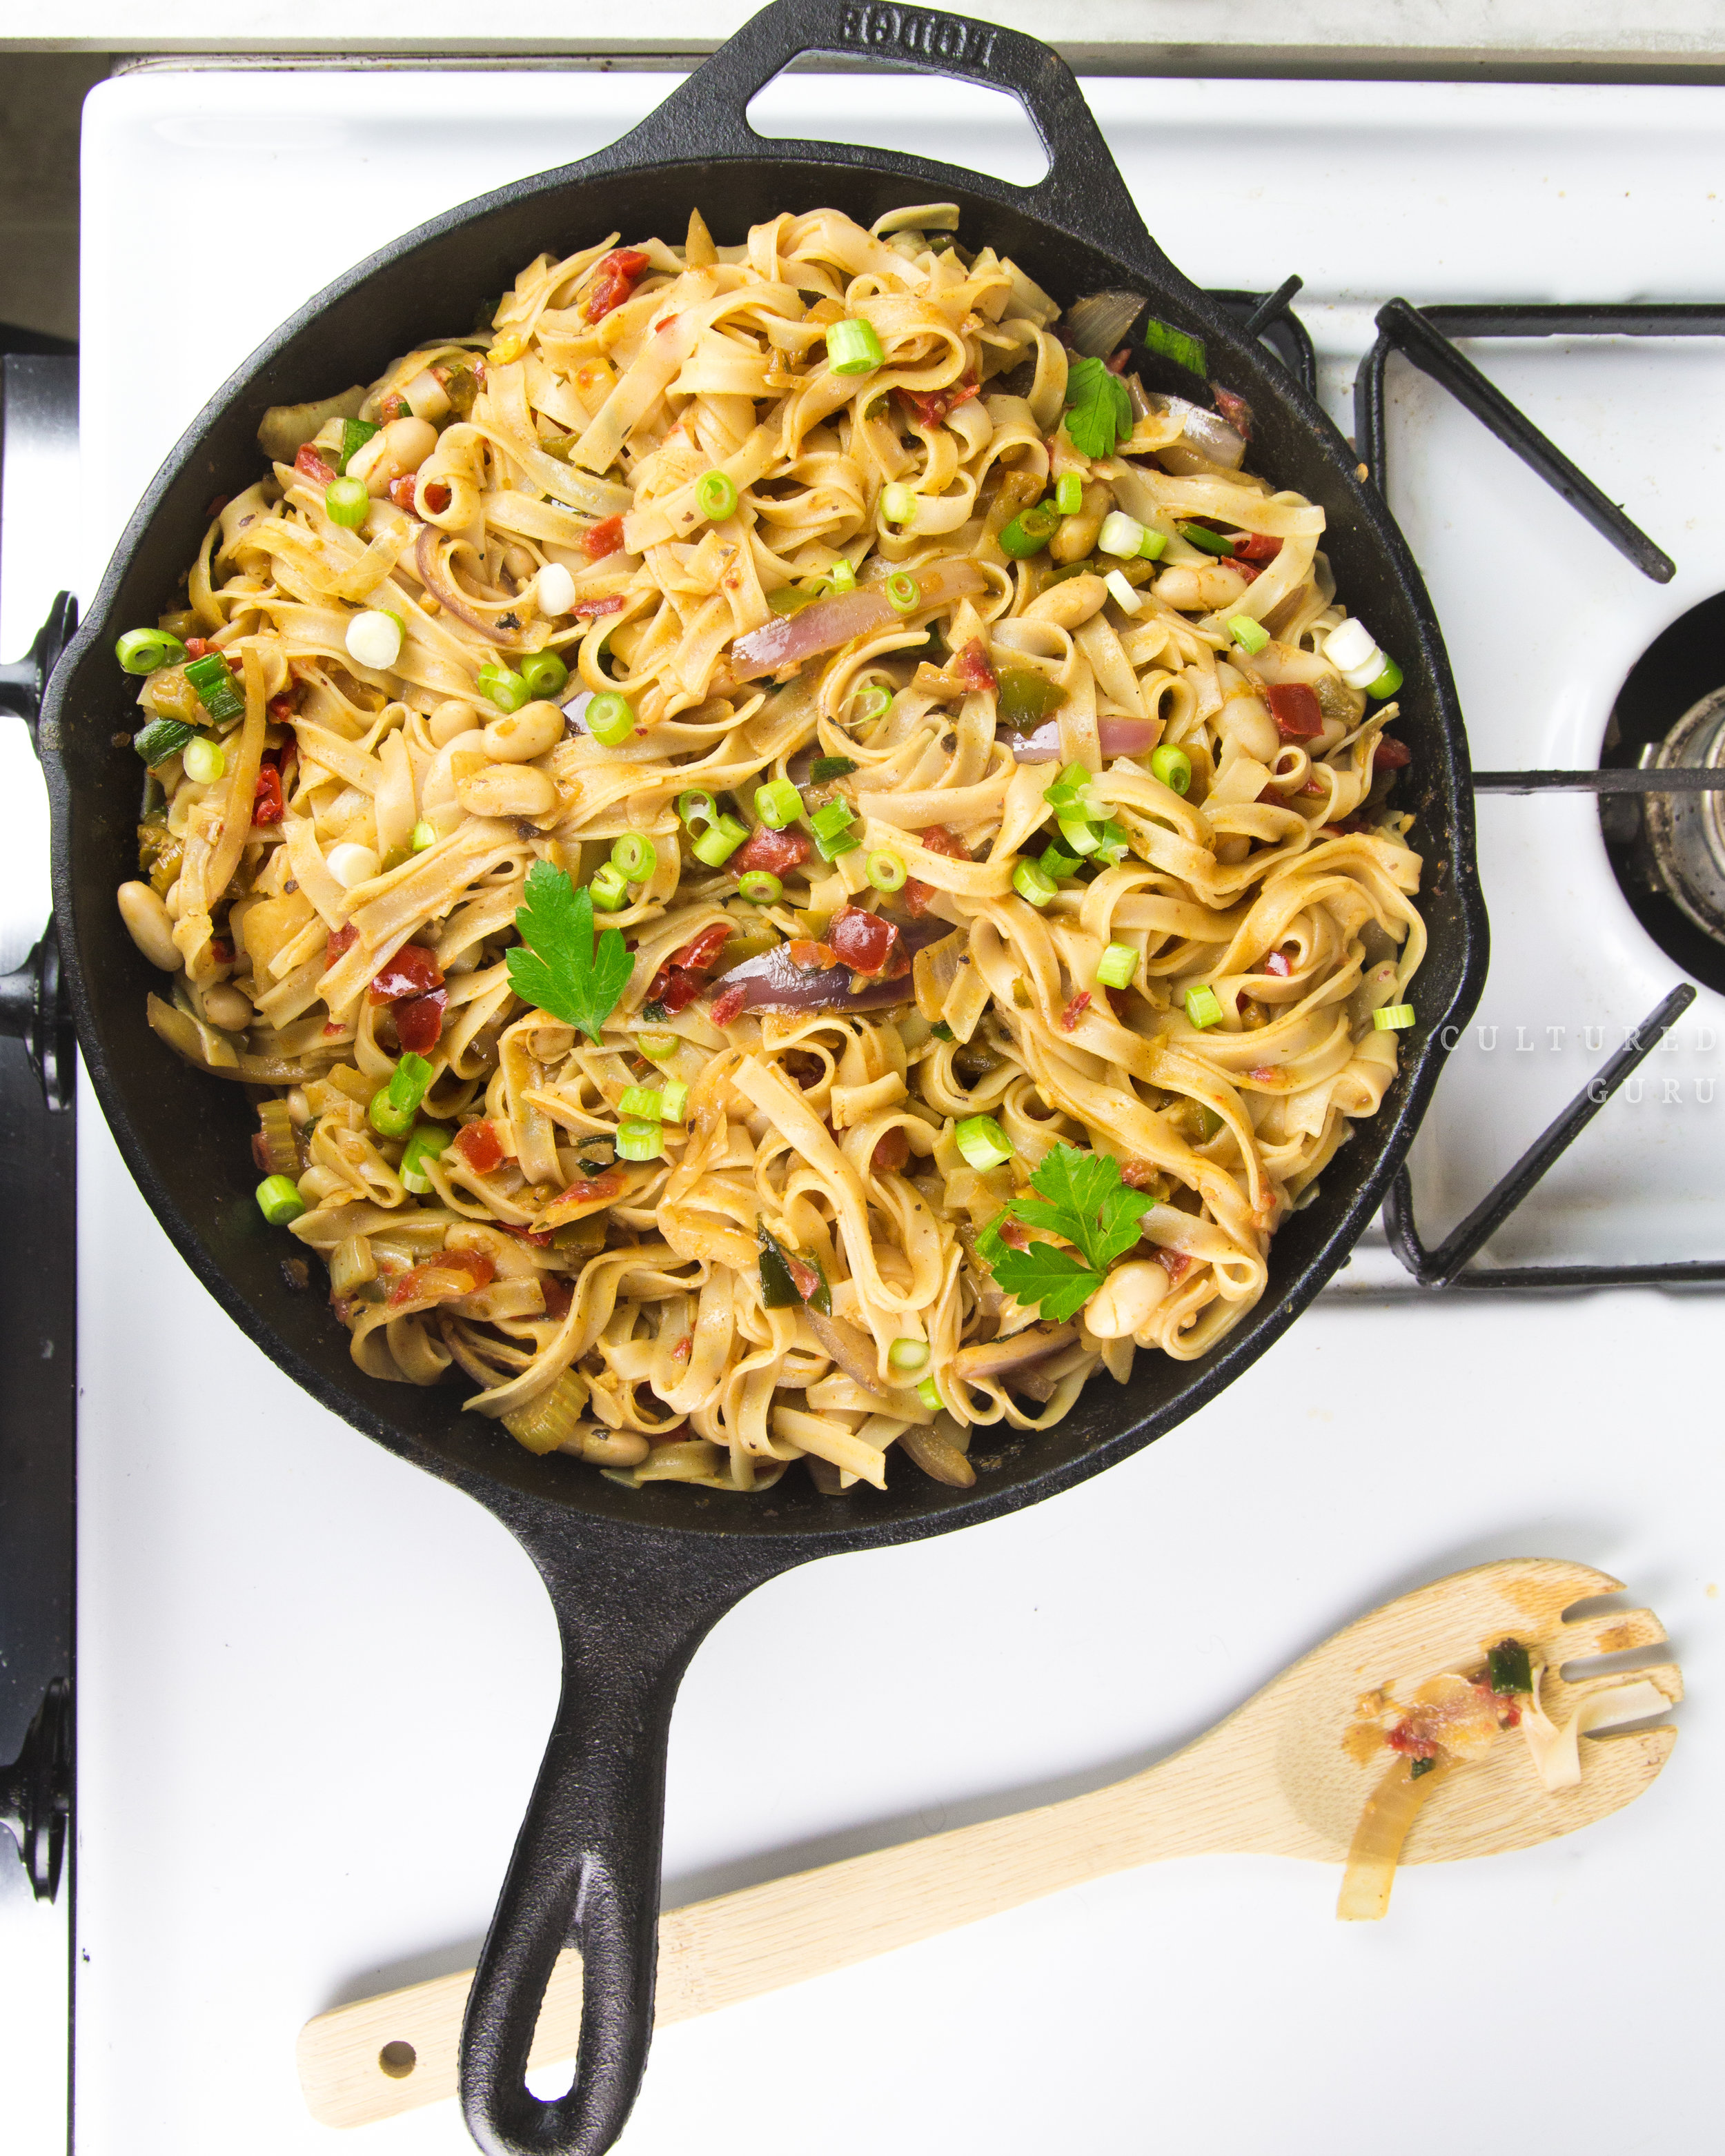 Vegan Food | Plant Based Diet Pastalaya